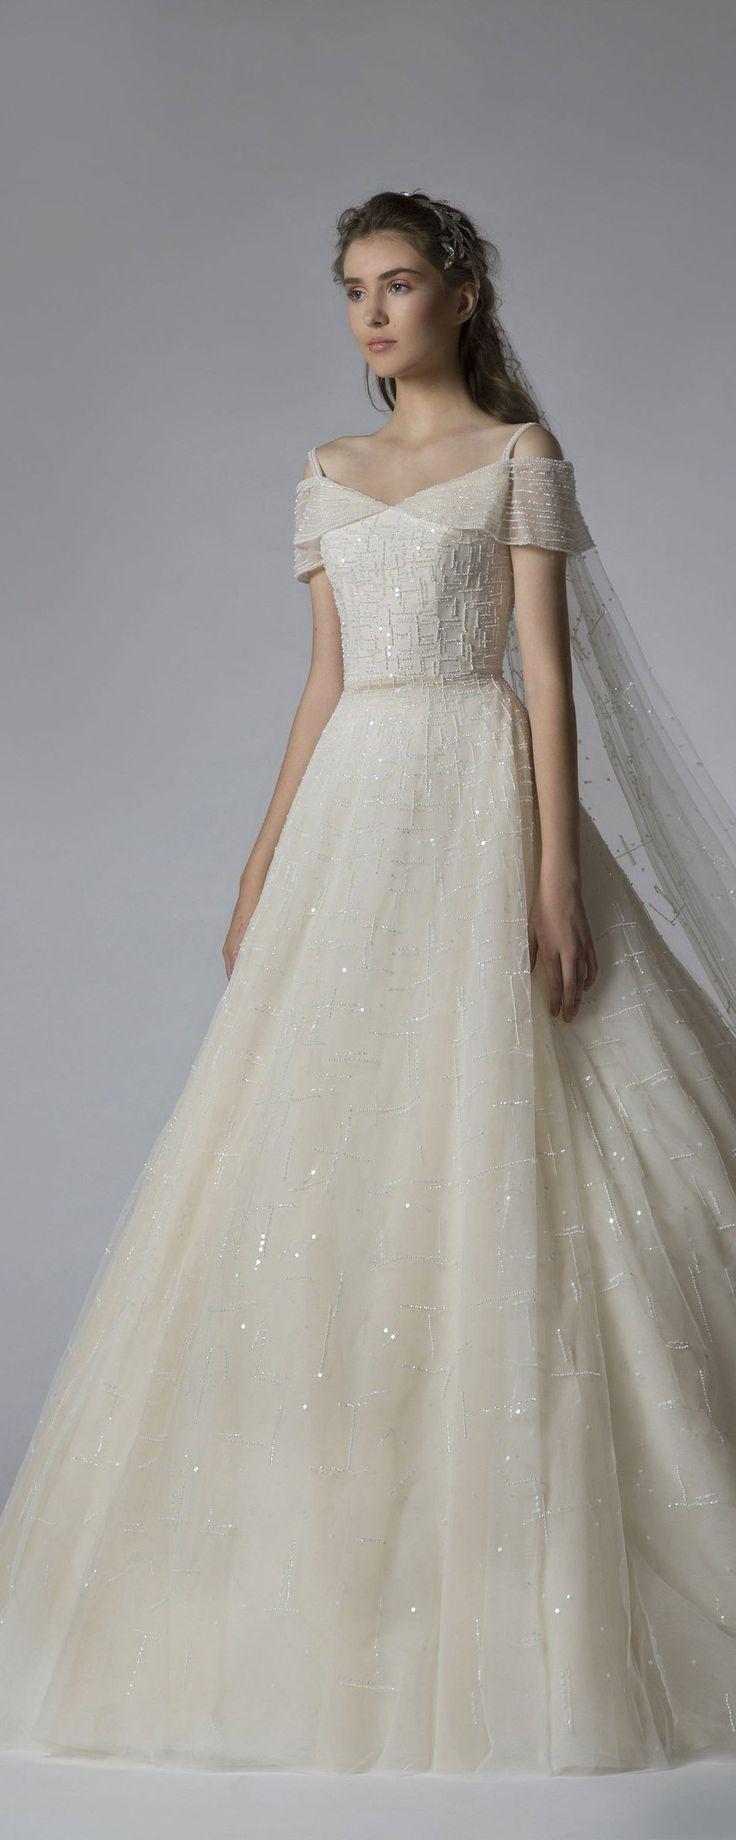 Georges Hobeika Fall Winter 2019 Best Wedding Dresses Designer Wedding Dresses Wedding Dresses